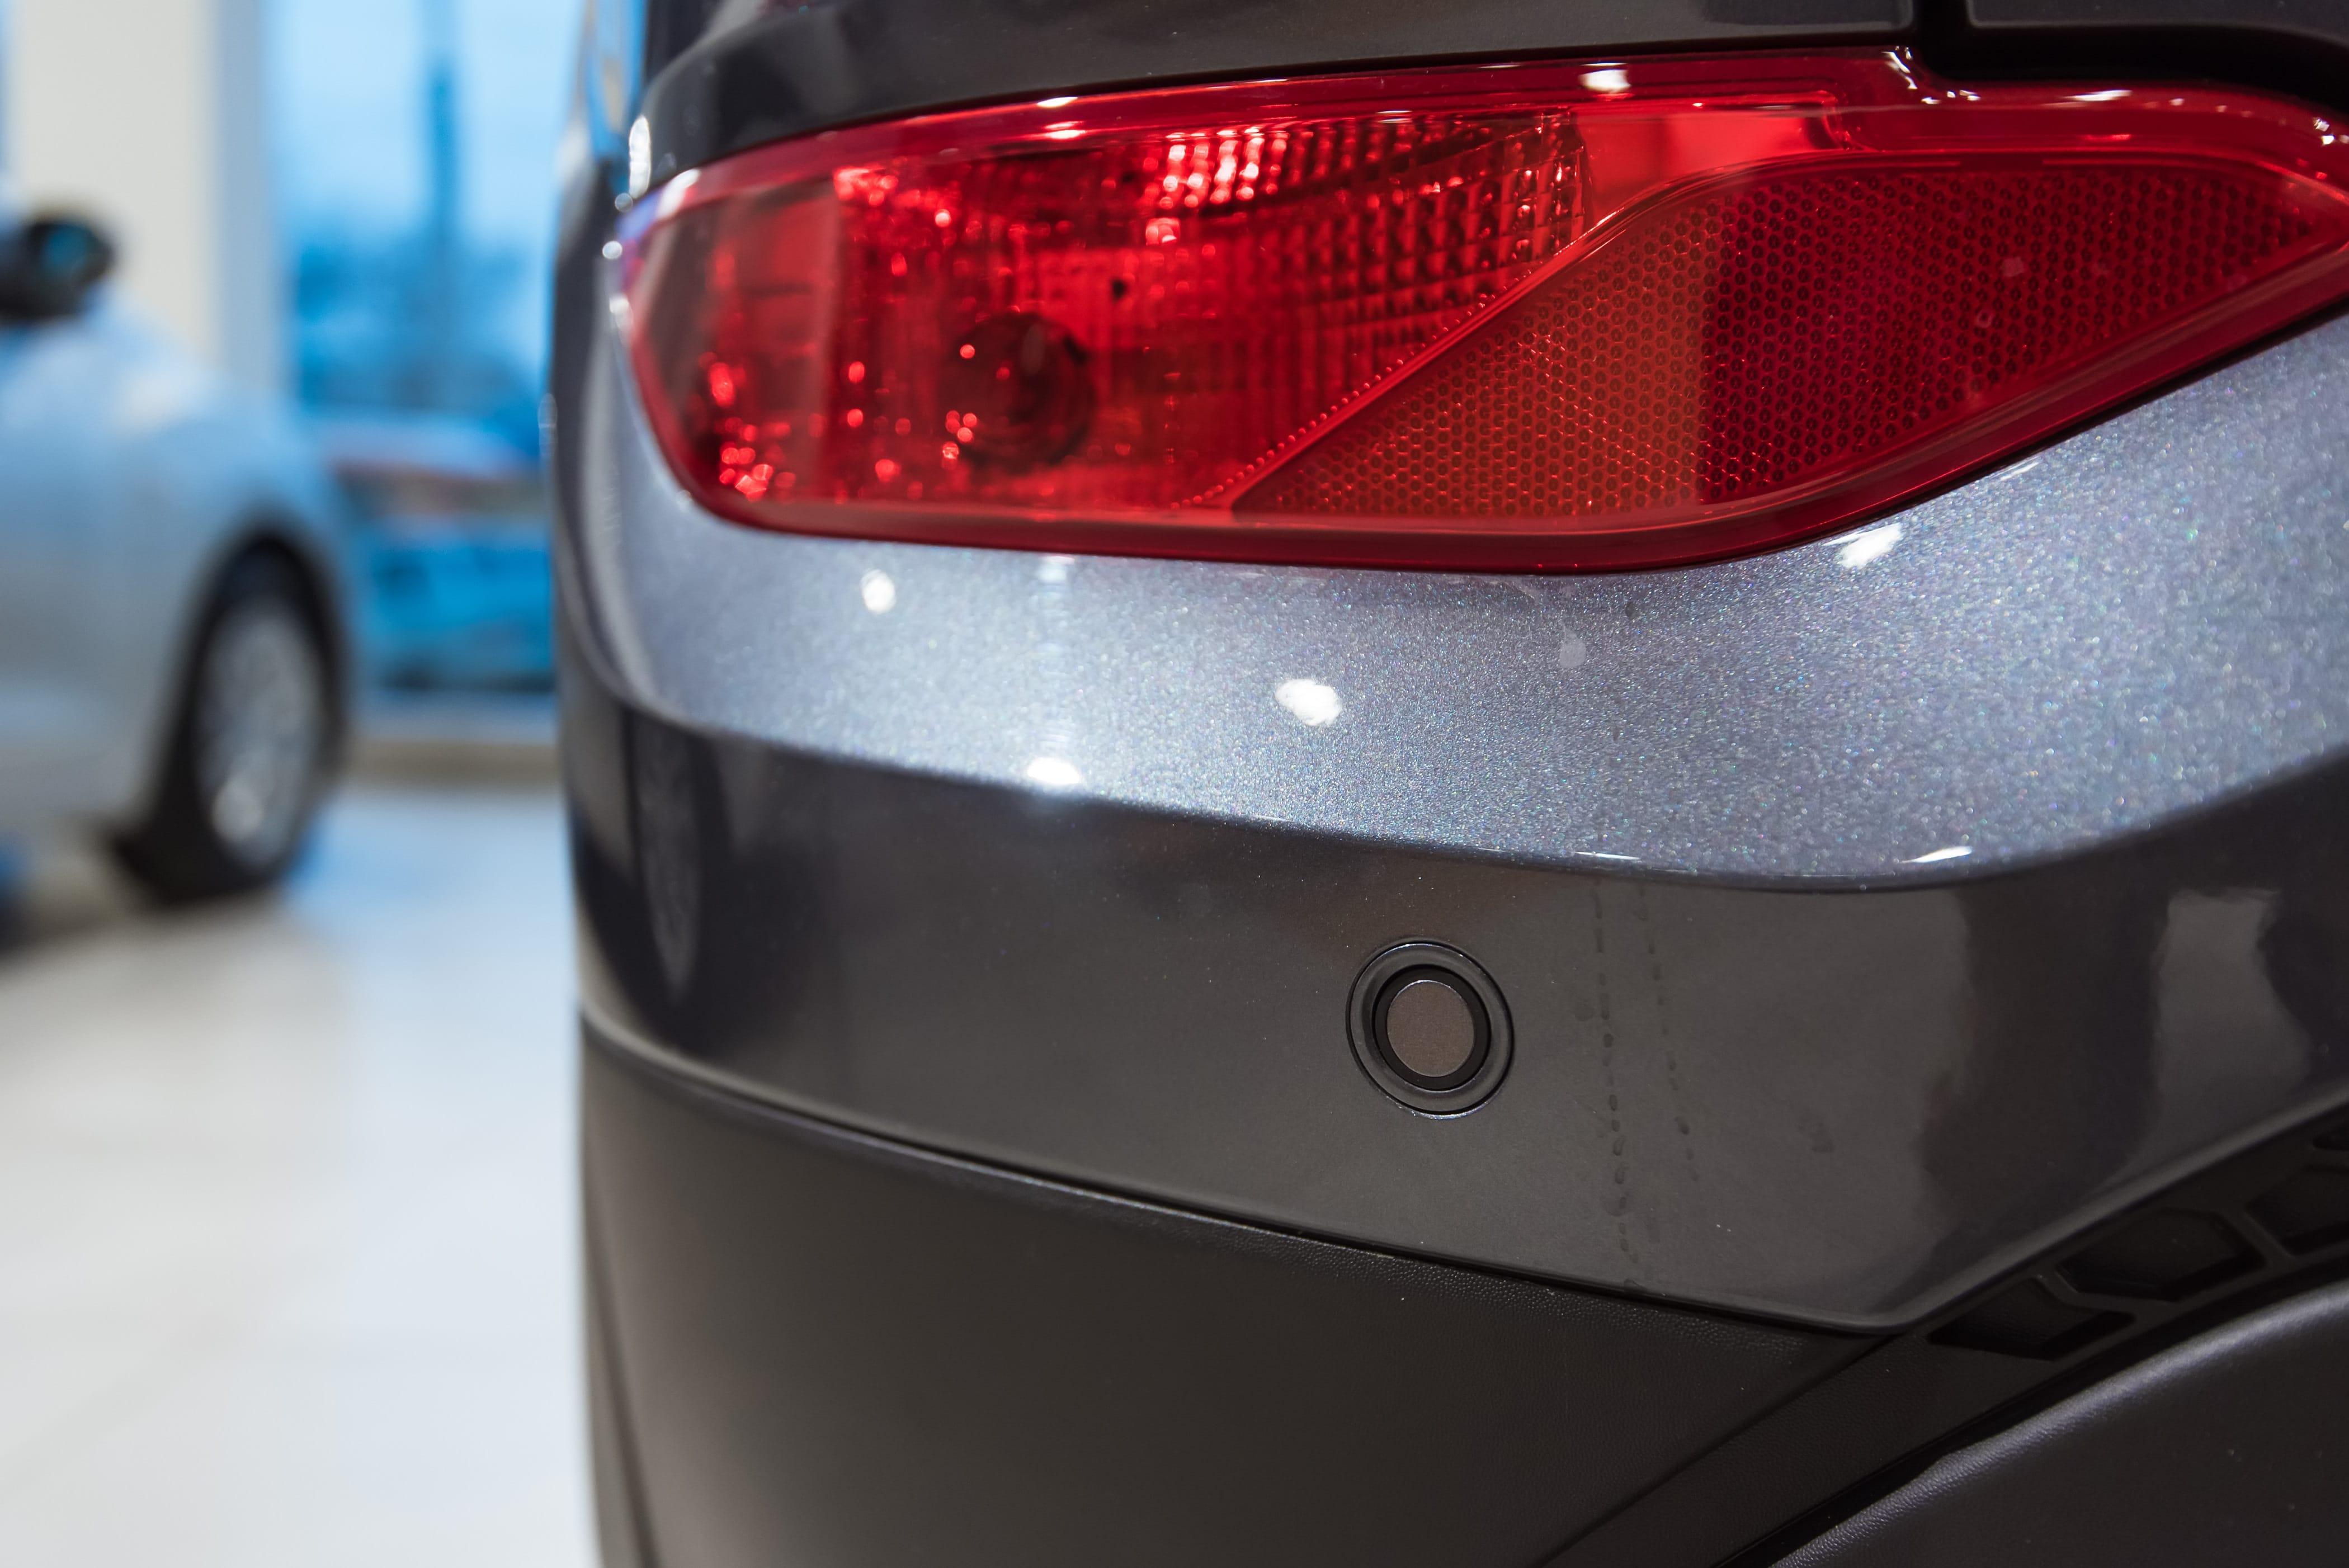 shutterstock 525229405 - Parking Sensors